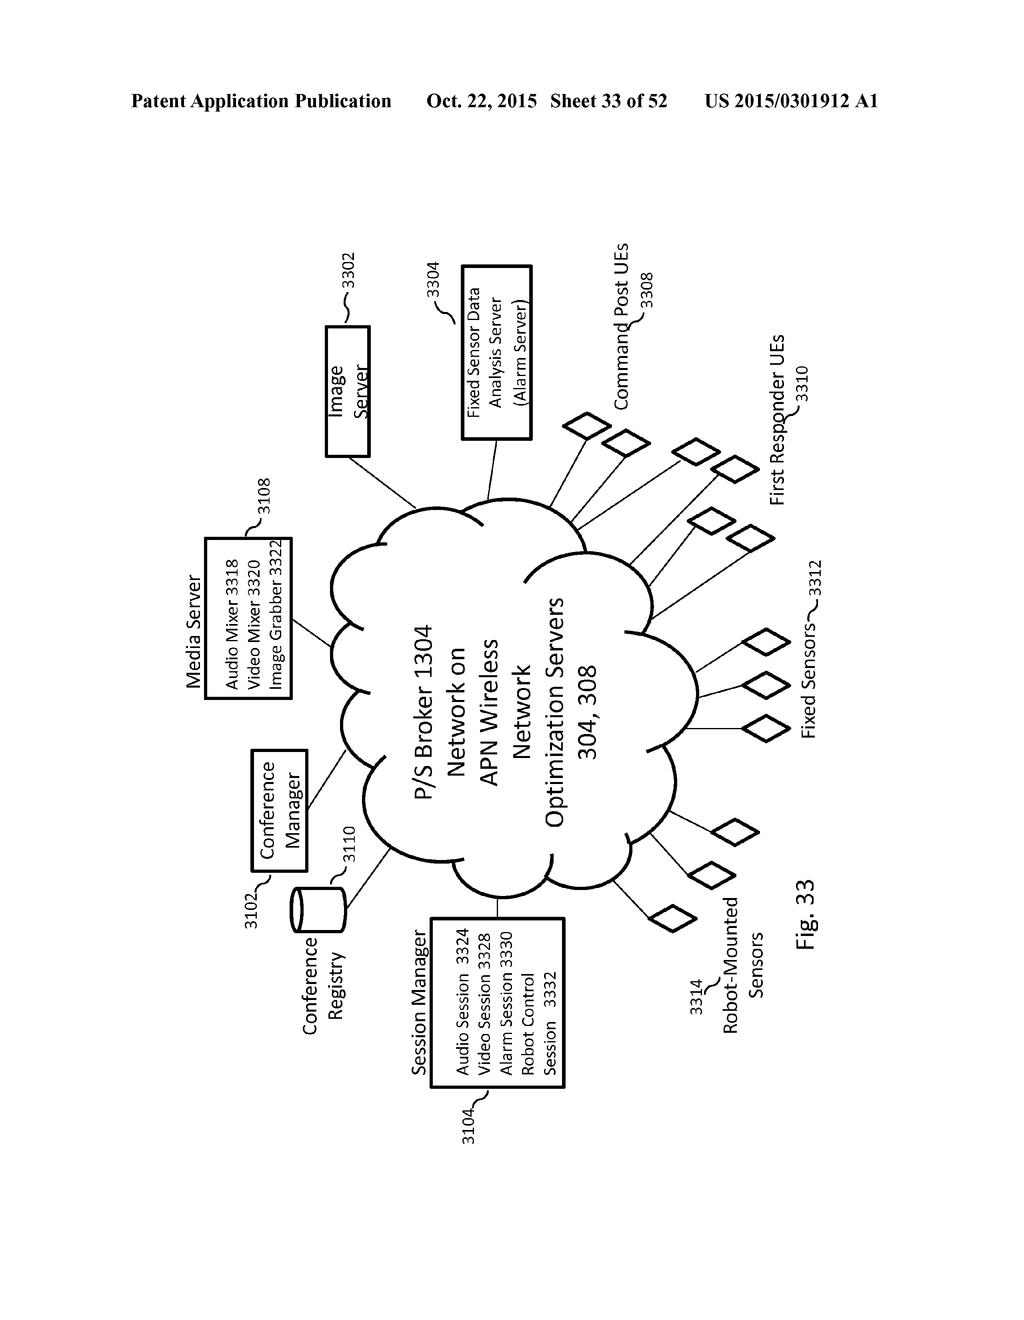 Active Hot Standby Redundancy For Broadband Wireless Network Netowrk Diagram Schematic And Image 34